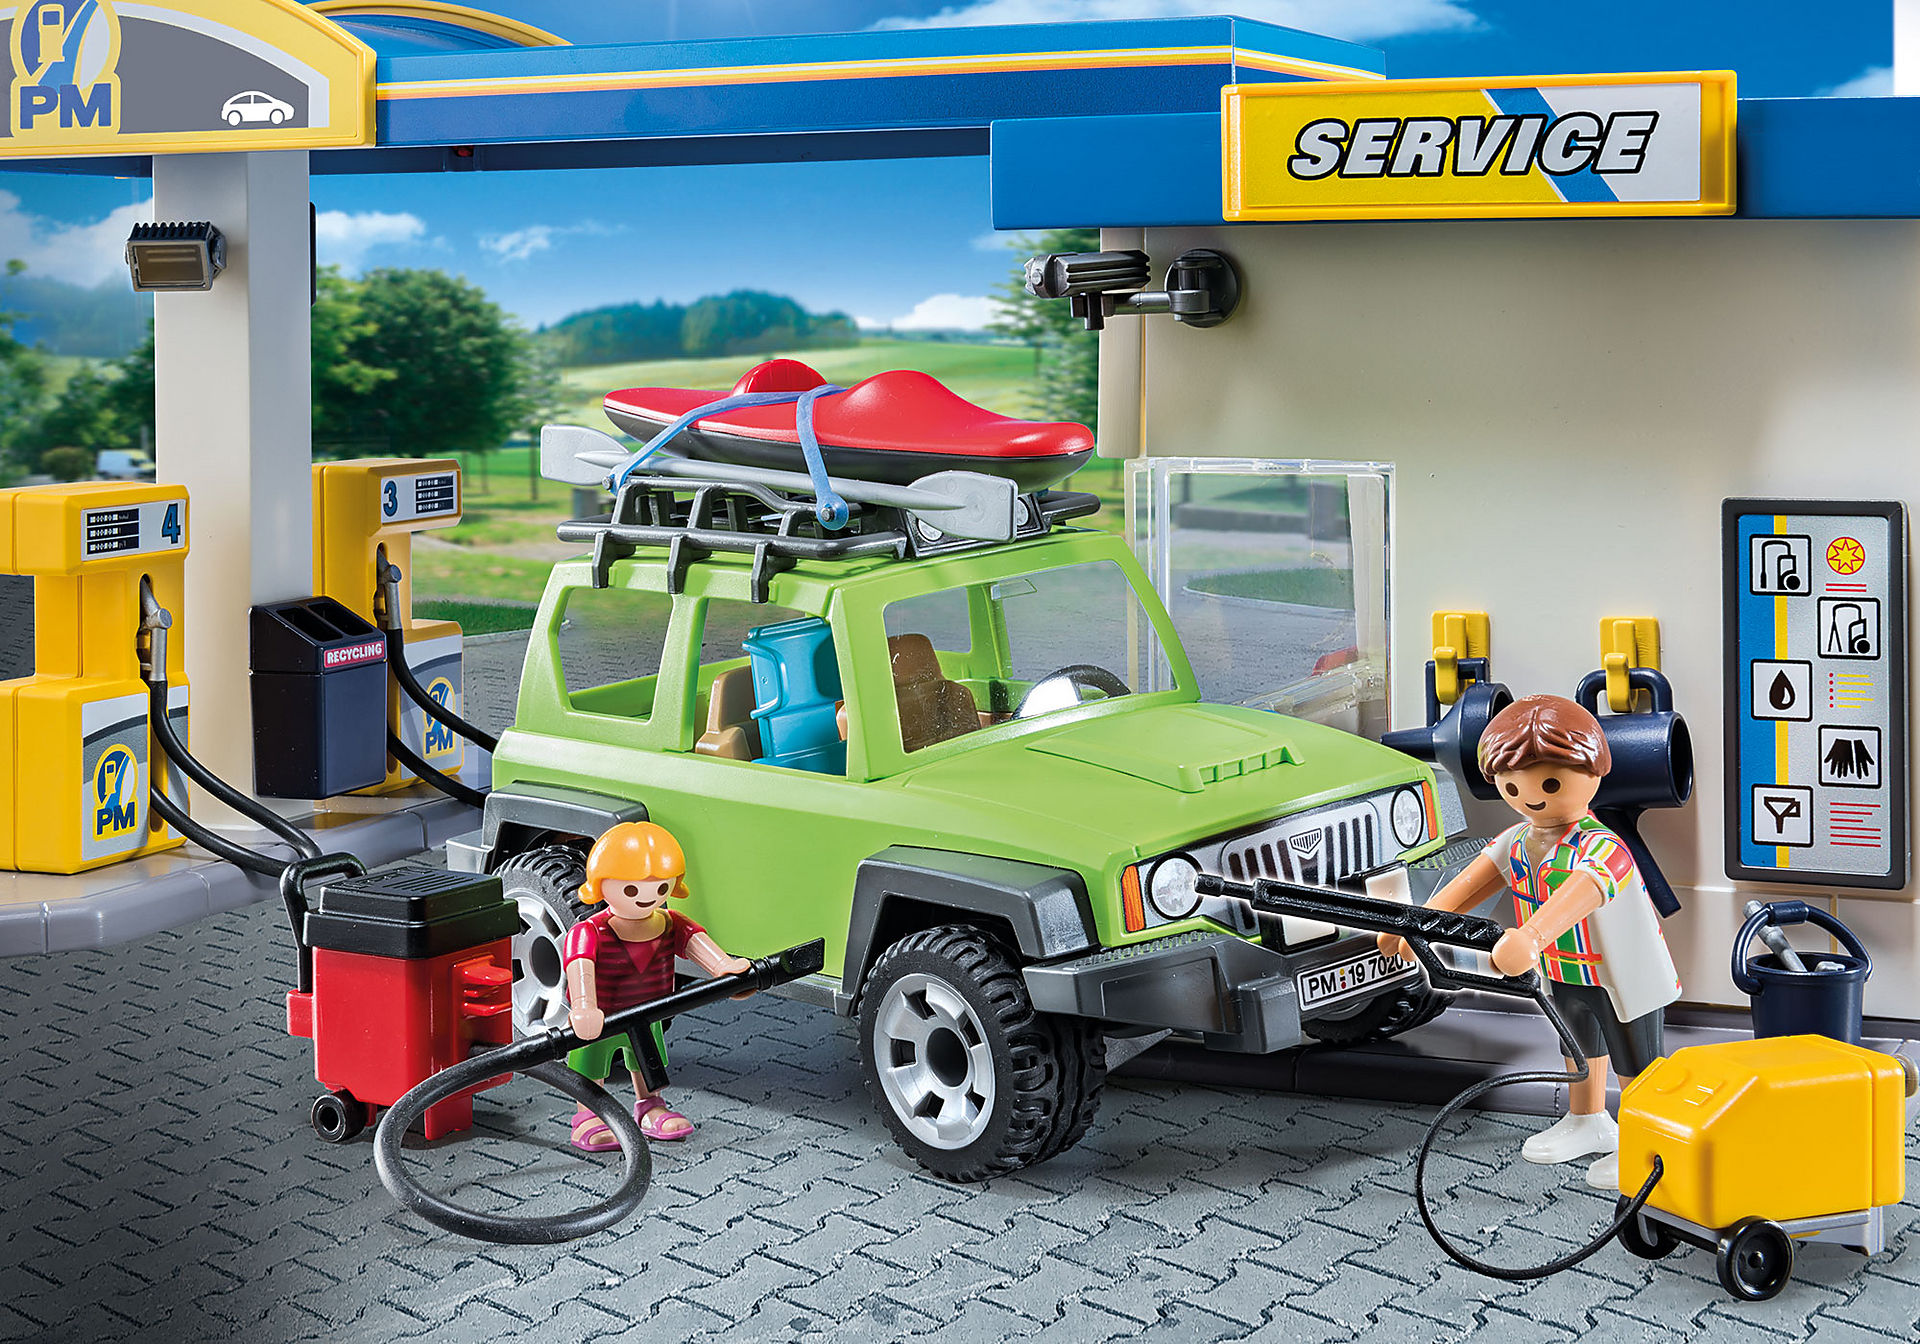 http://media.playmobil.com/i/playmobil/70201_product_extra2/Station service